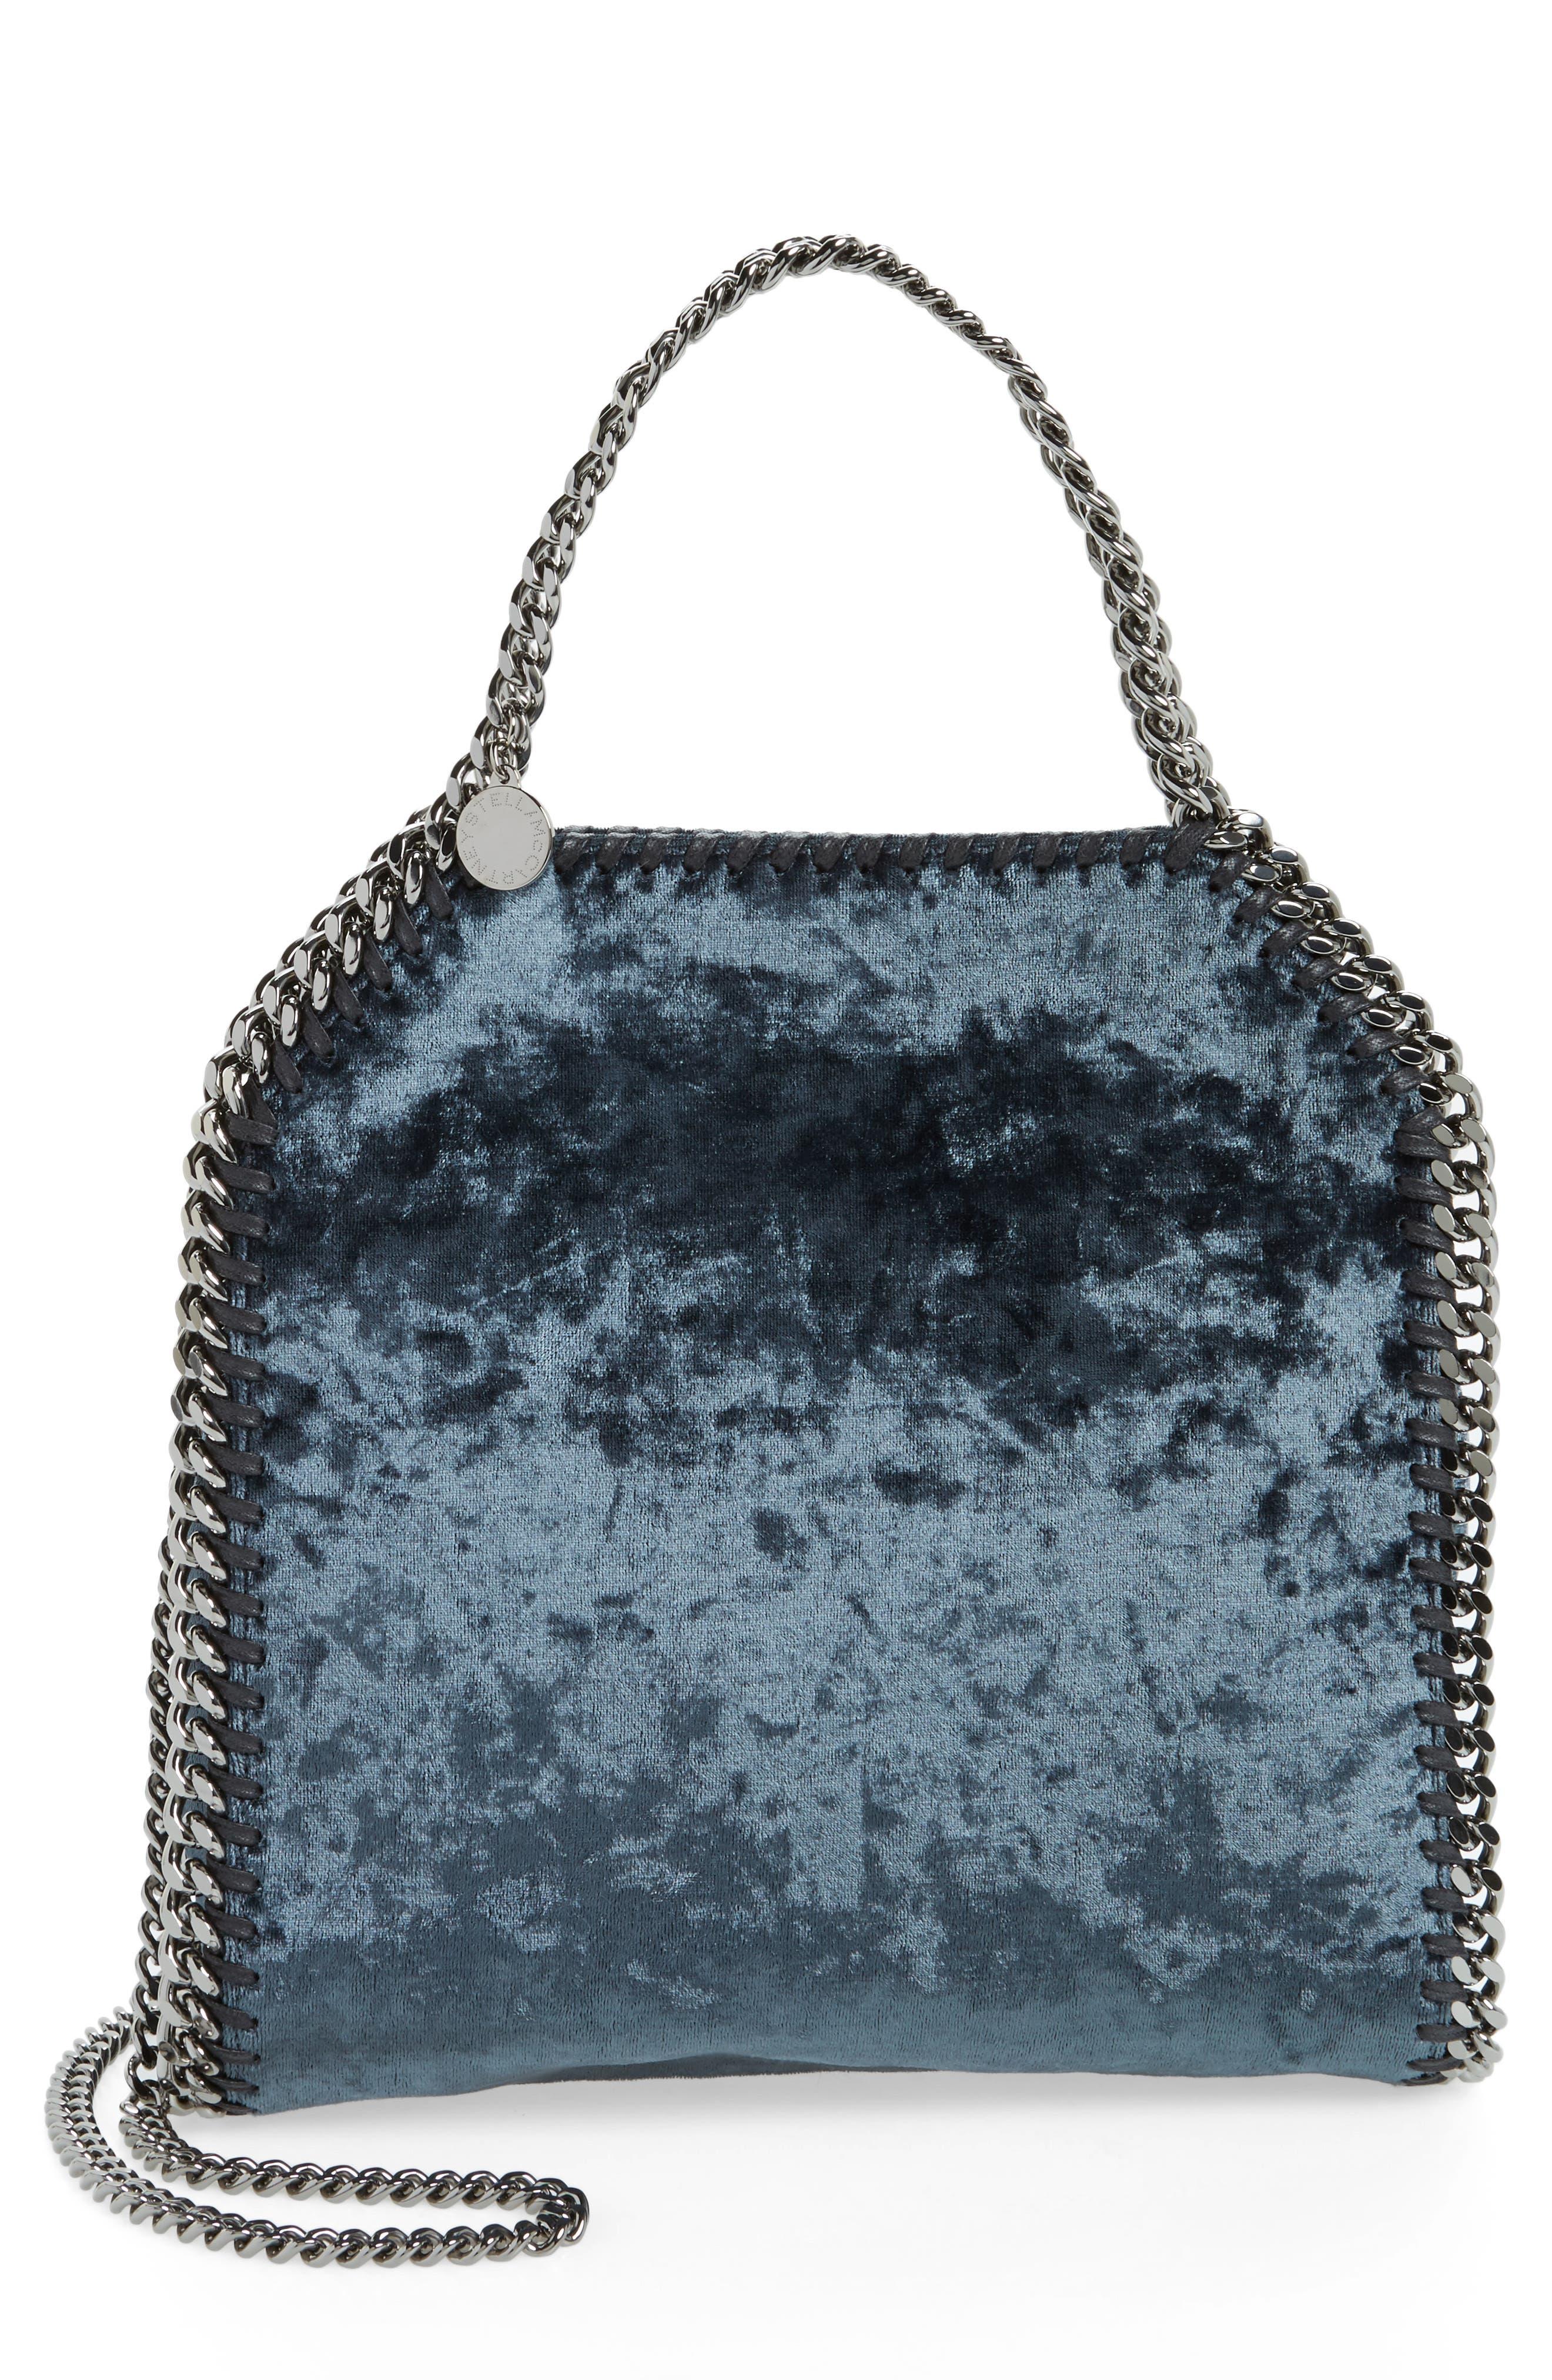 Main Image - Stella McCartney Mini Falabella Crushed Velvet Bag